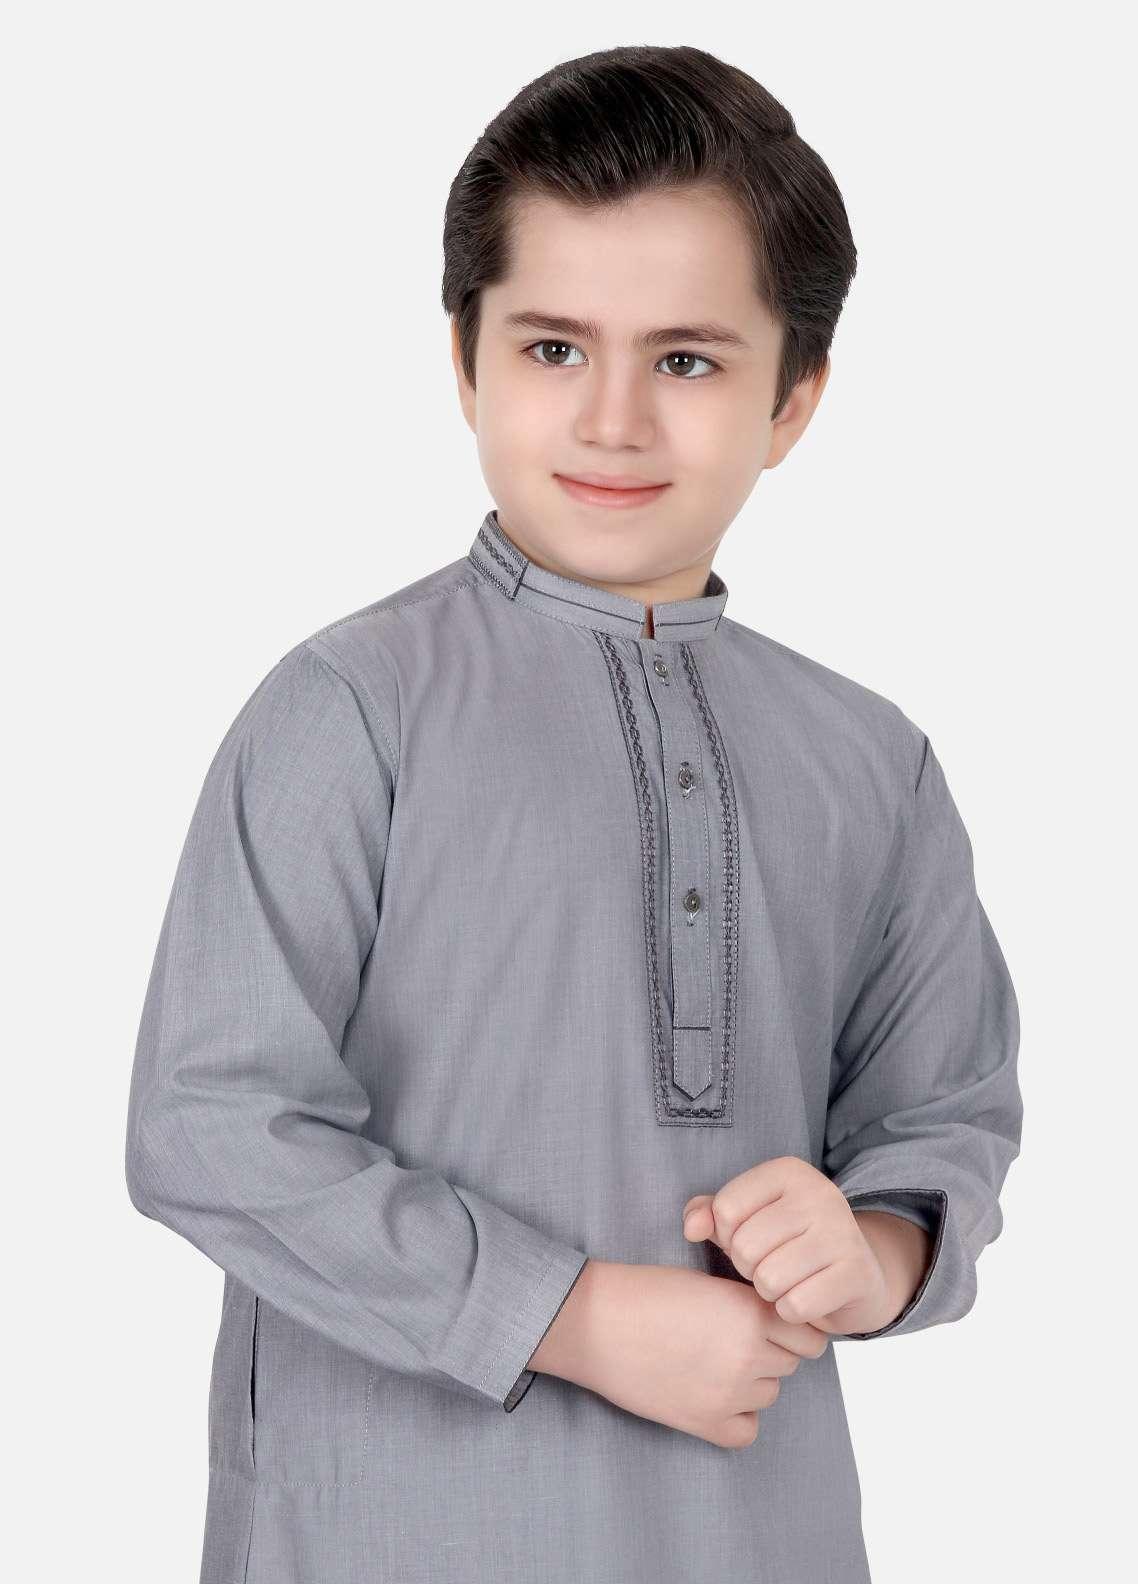 Edenrobe Cotton Embroidered Boys Kameez Shalwar - Grey EDS18B 3546